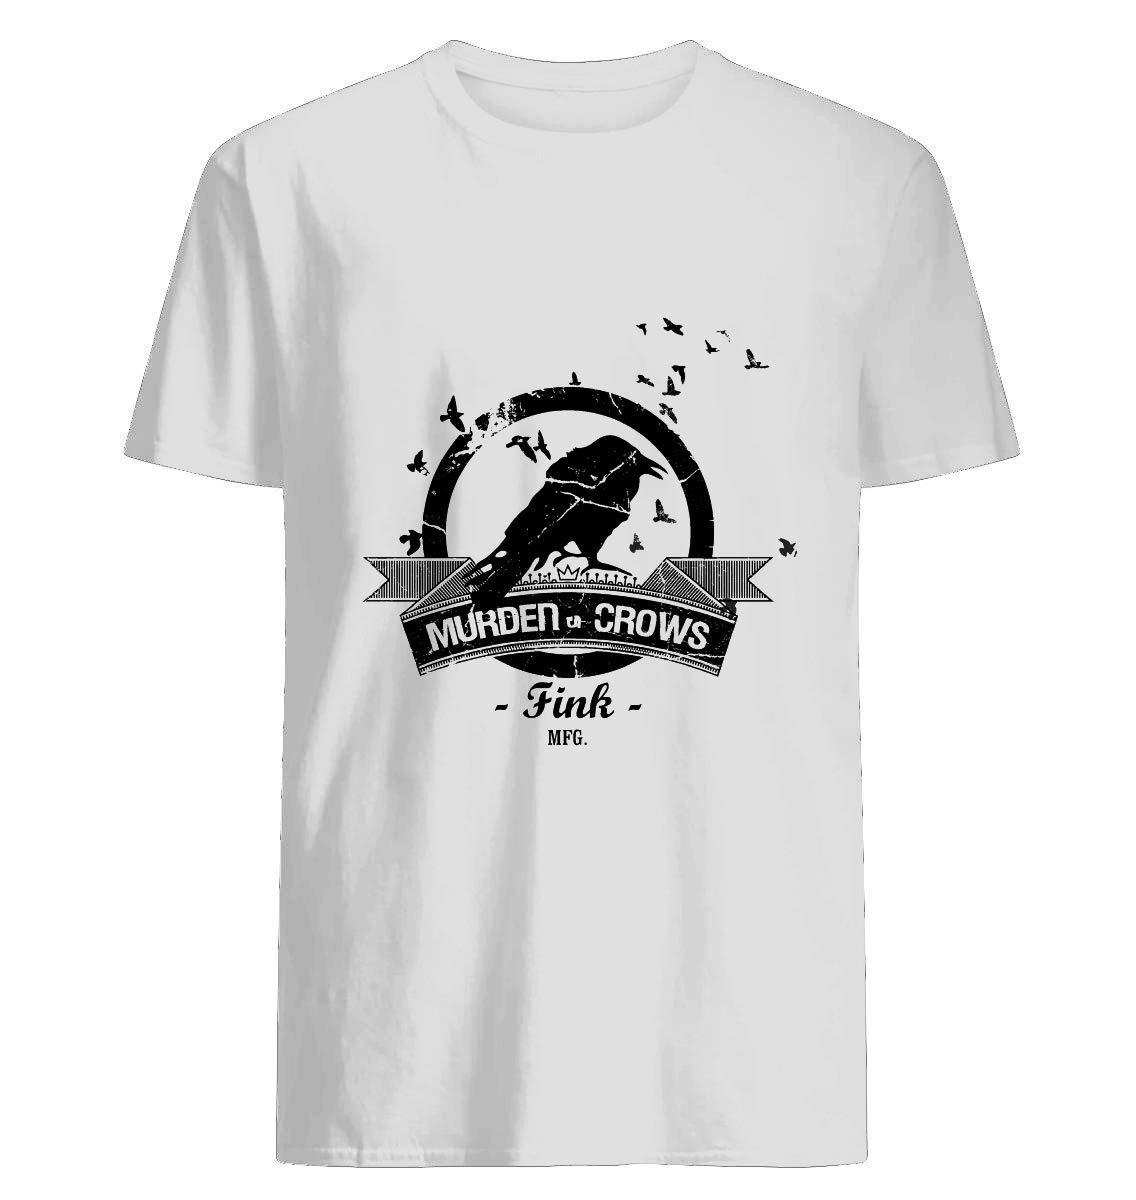 Bioshock Infinite Murder Of Crows Vigor Shirt T Shirt For Unisex